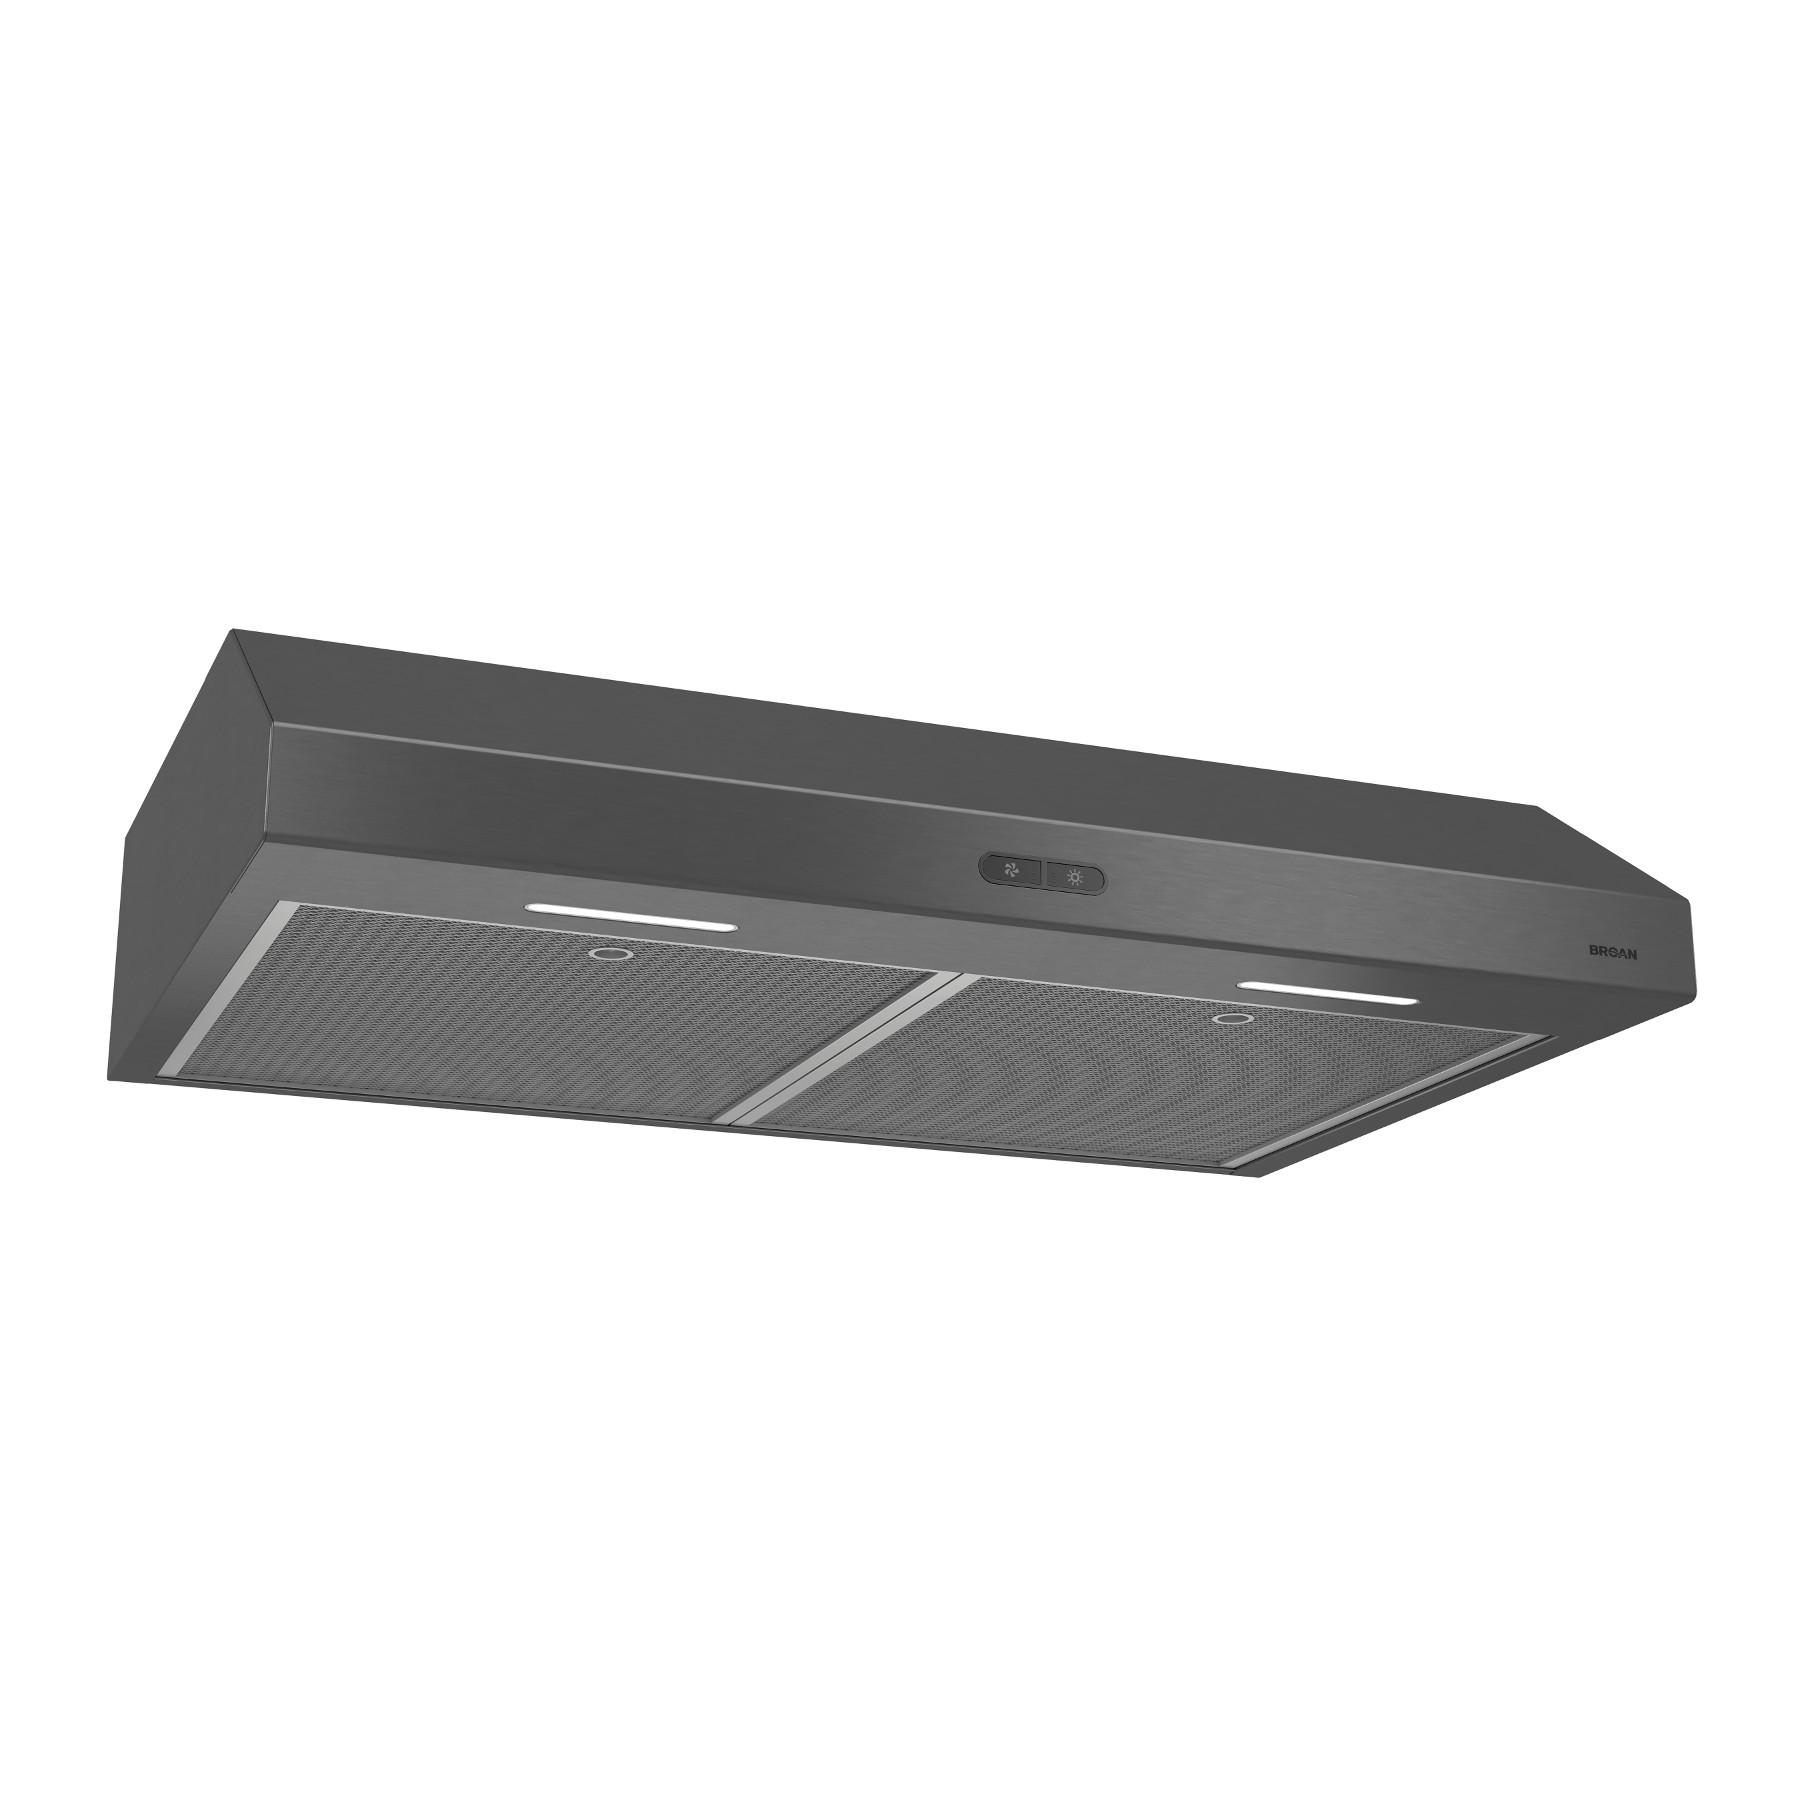 broan glacier 30 inch convertible under cabinet range hood 375 max blower cfm black stainless steel